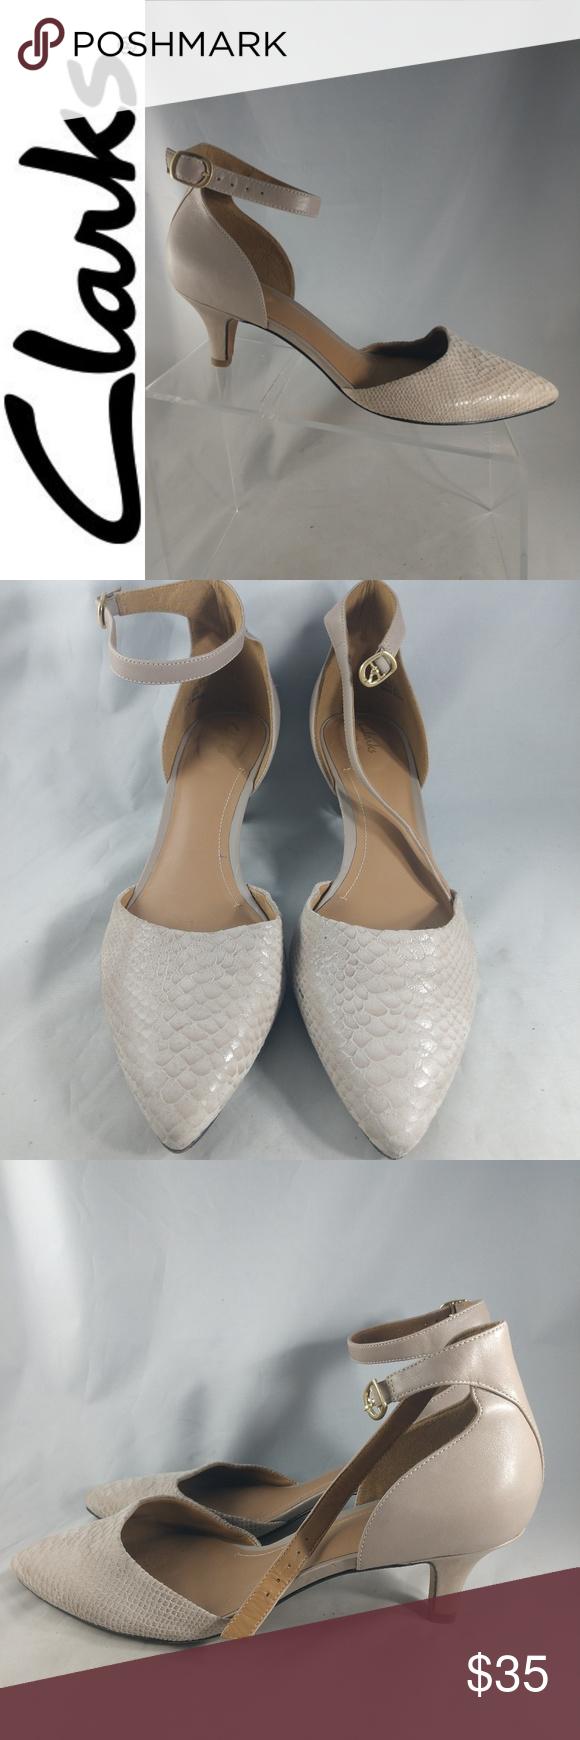 Clarks Artisan Beige Snake Leather Kitten Heel 9m Shoes Women Heels Snake Leather Clarks